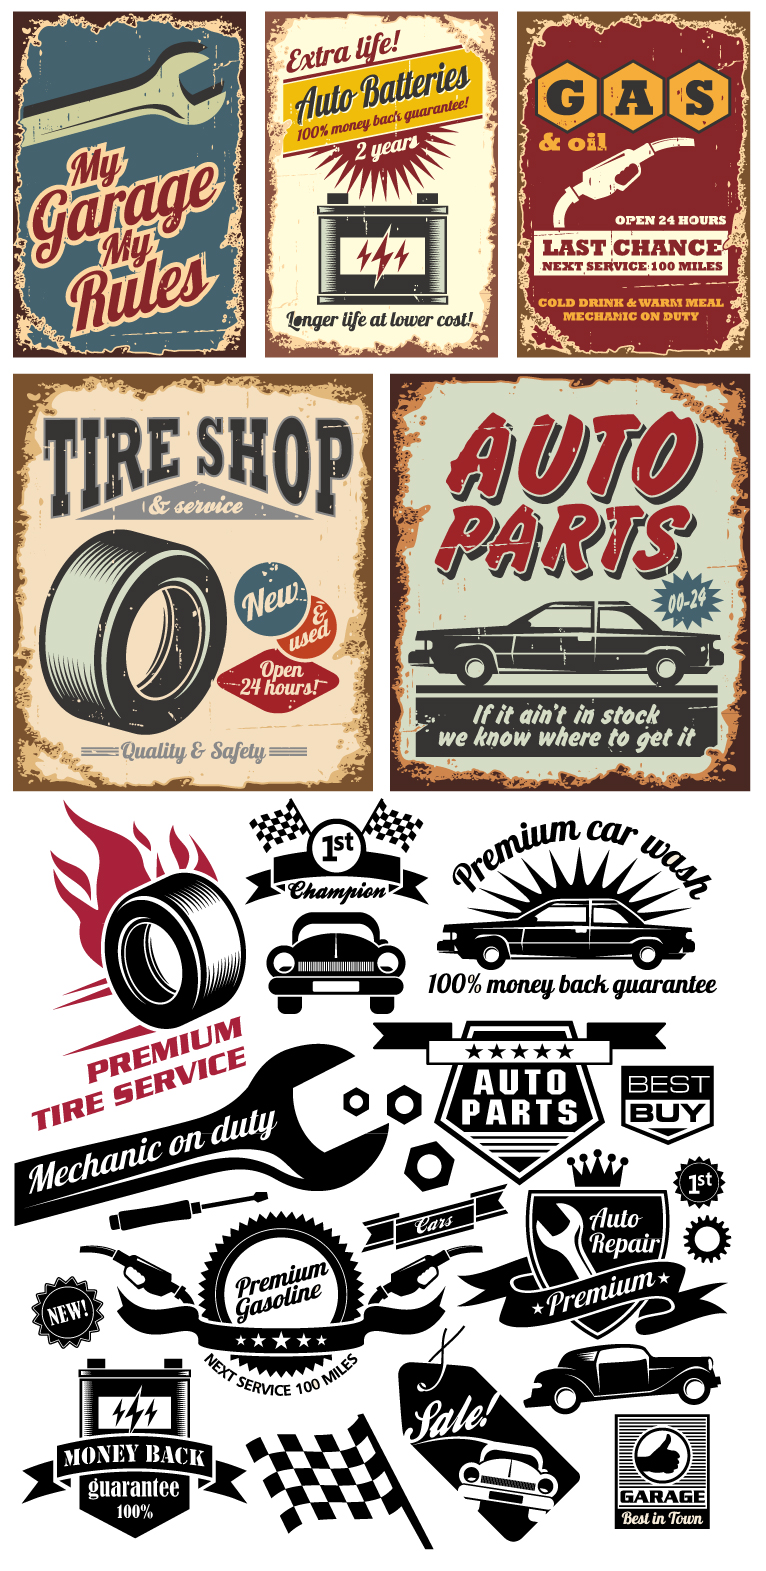 Premium Tire Service